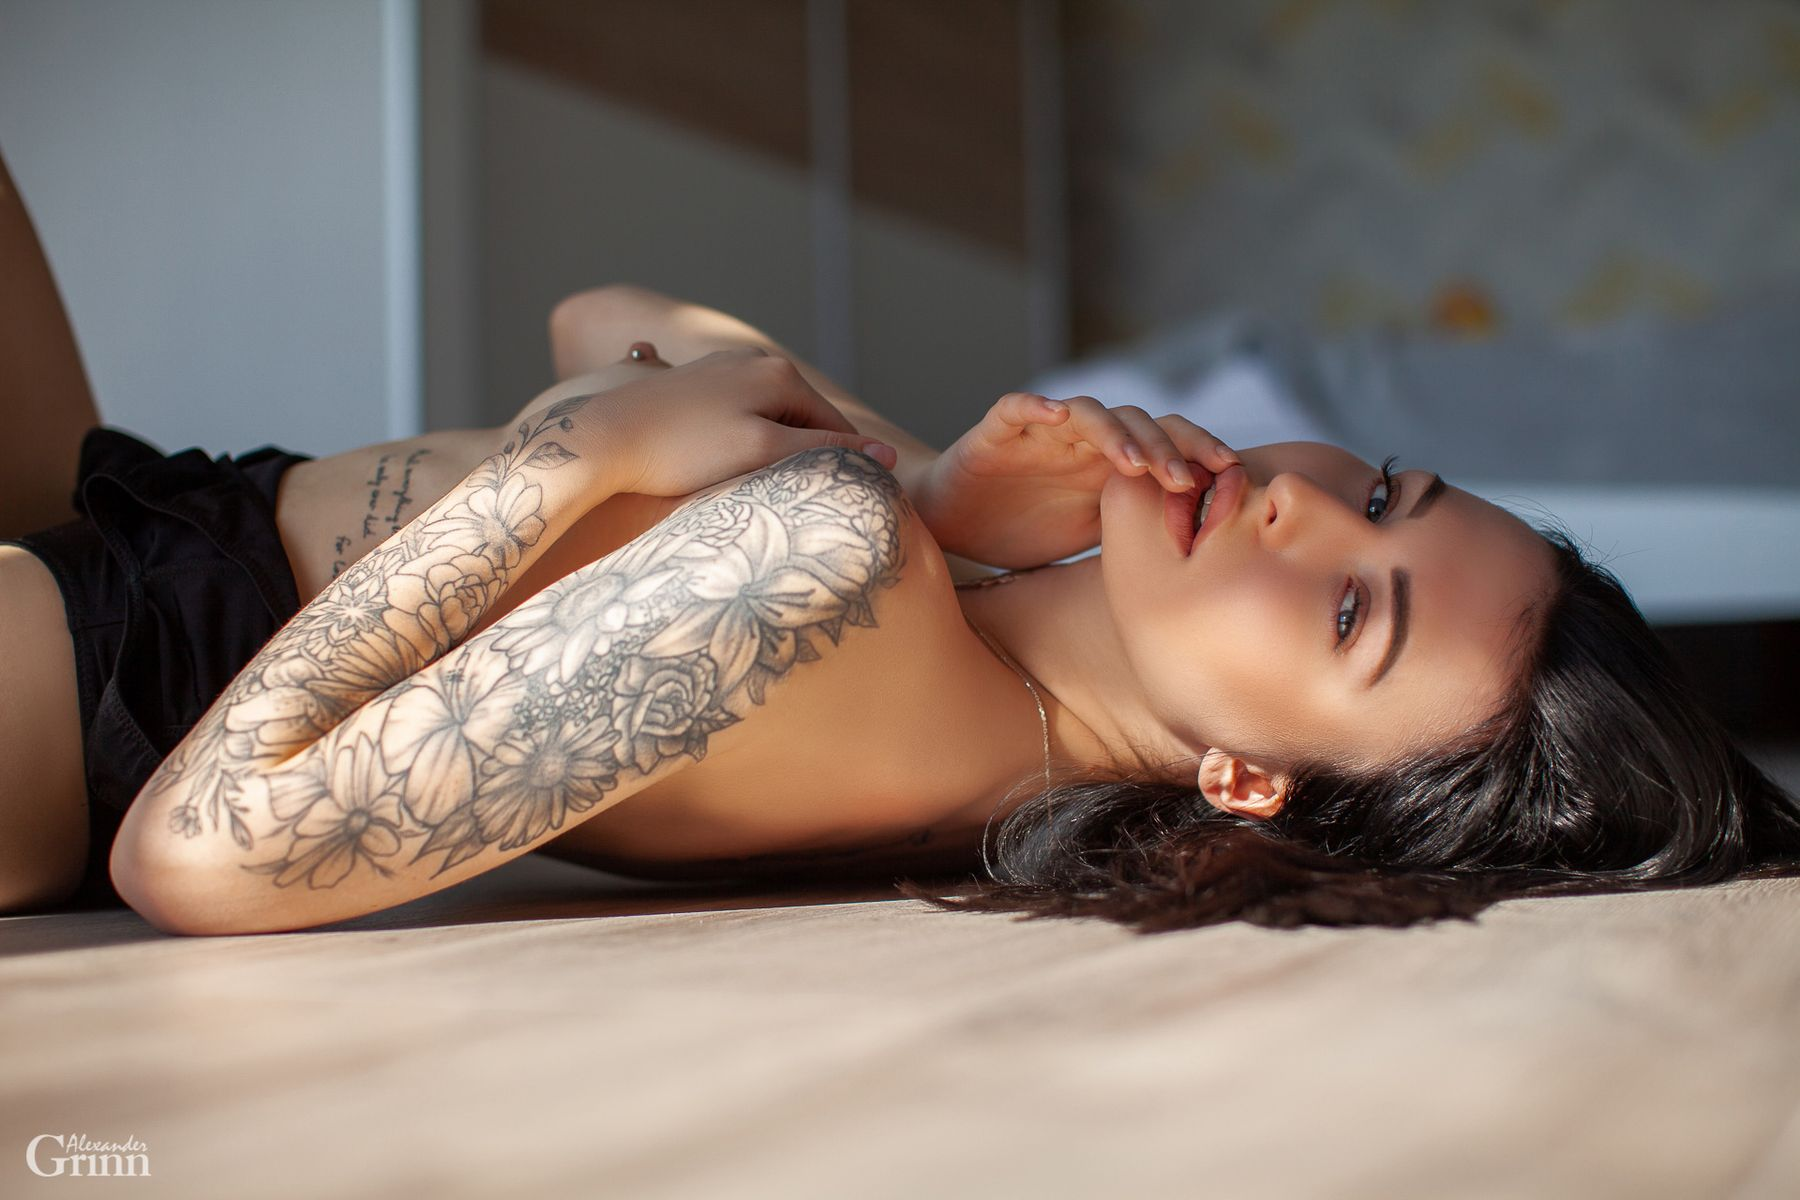 Stasya alexandergrinn белье одесса lingerie brunette